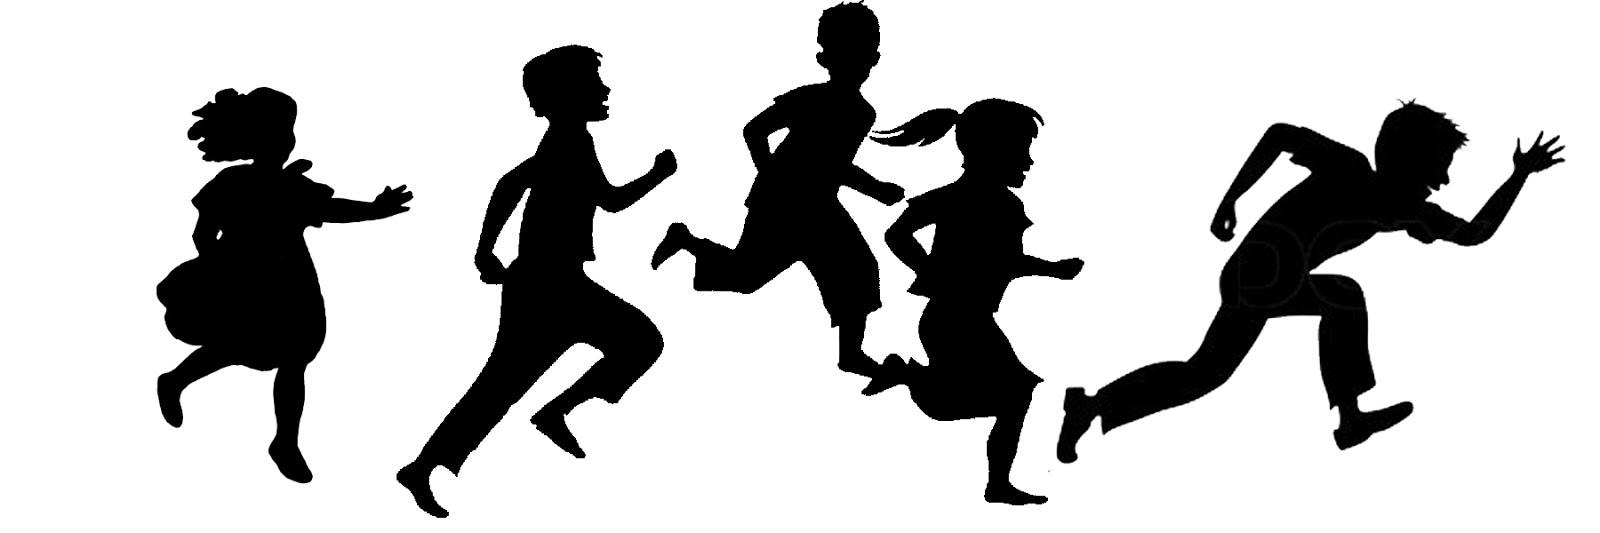 1600x533 Children Running Silhouette